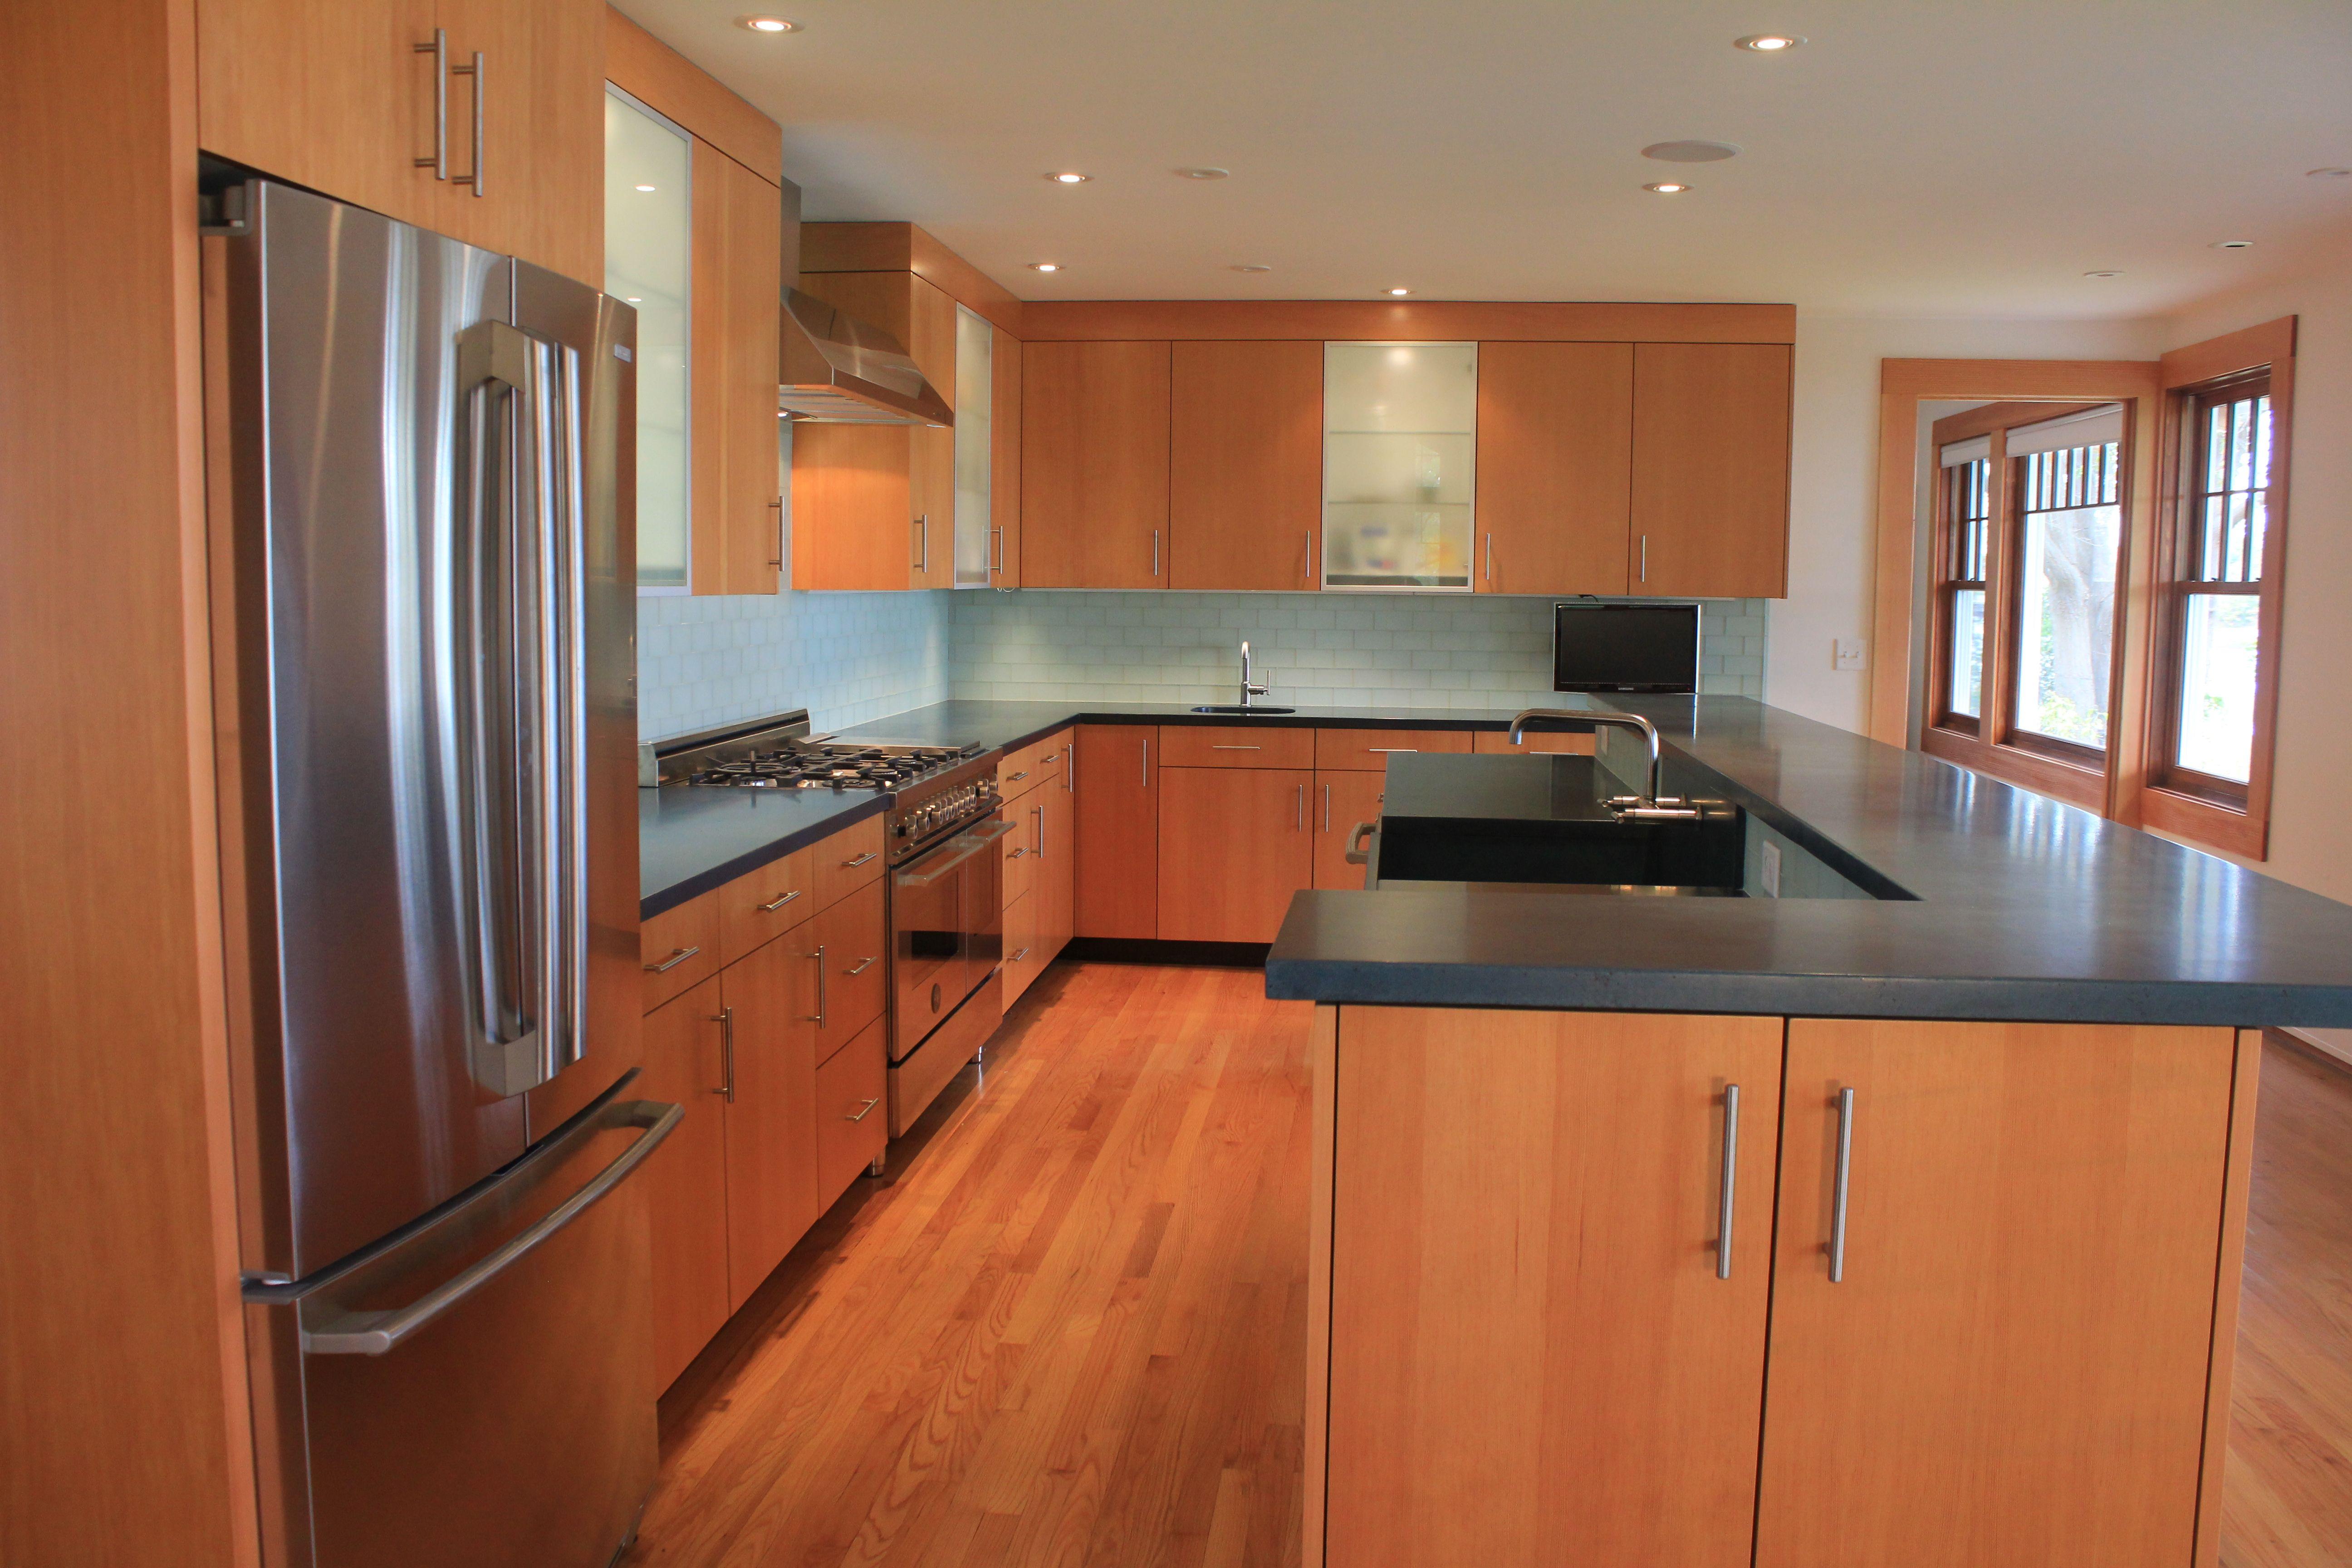 Modern Kitchen With Douglas Fir Veneer Concrete Counter Tops And Glass Subway Tile Backspla Kitchen Countertops Kitchen Island Countertop Kitchen Inspirations